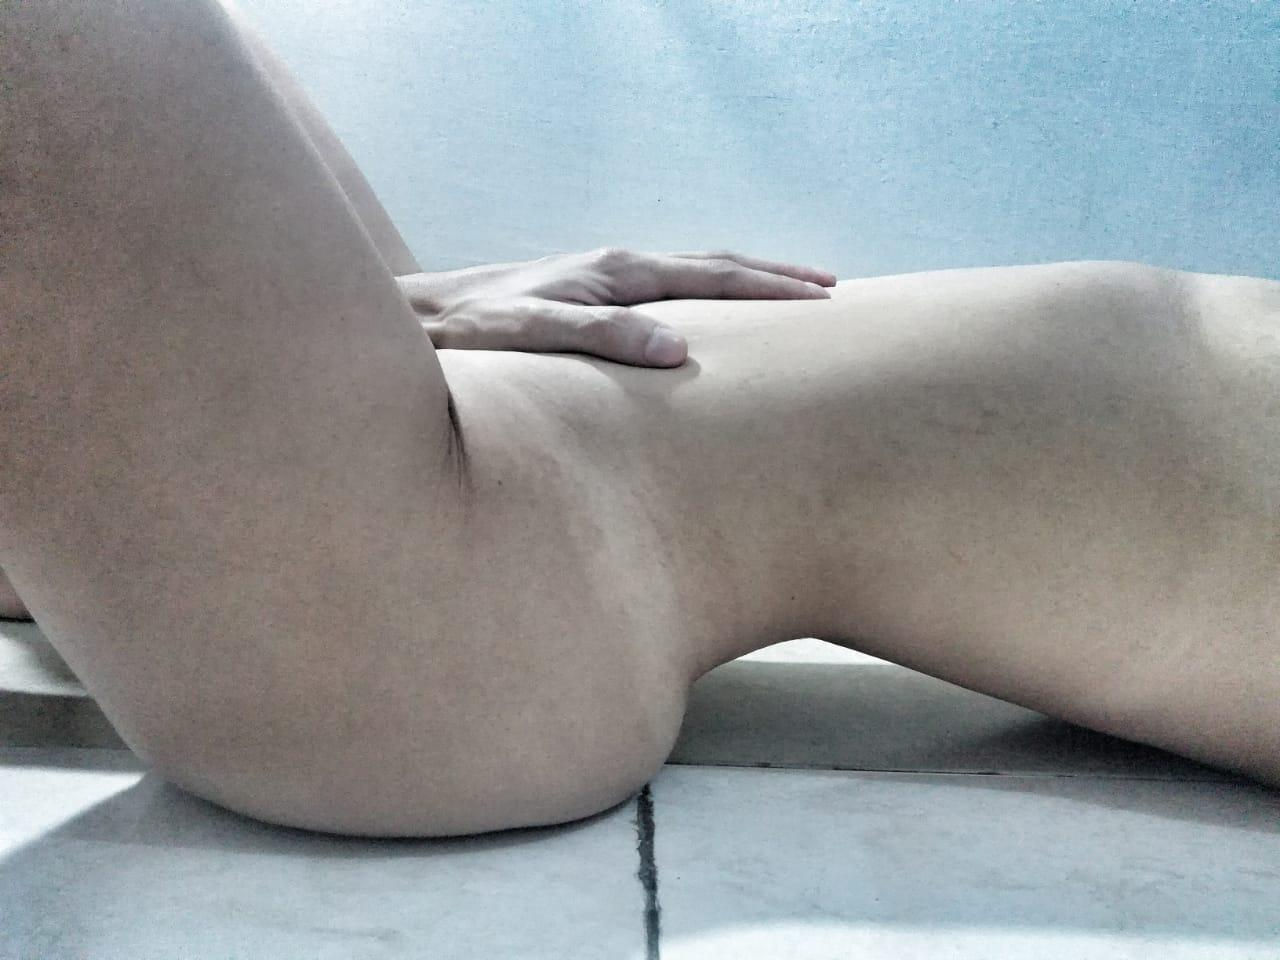 Sex horny?s=pbgc9d2r2ucm1o7ryeal5h1yqoqjxlkuvveok4paynw=